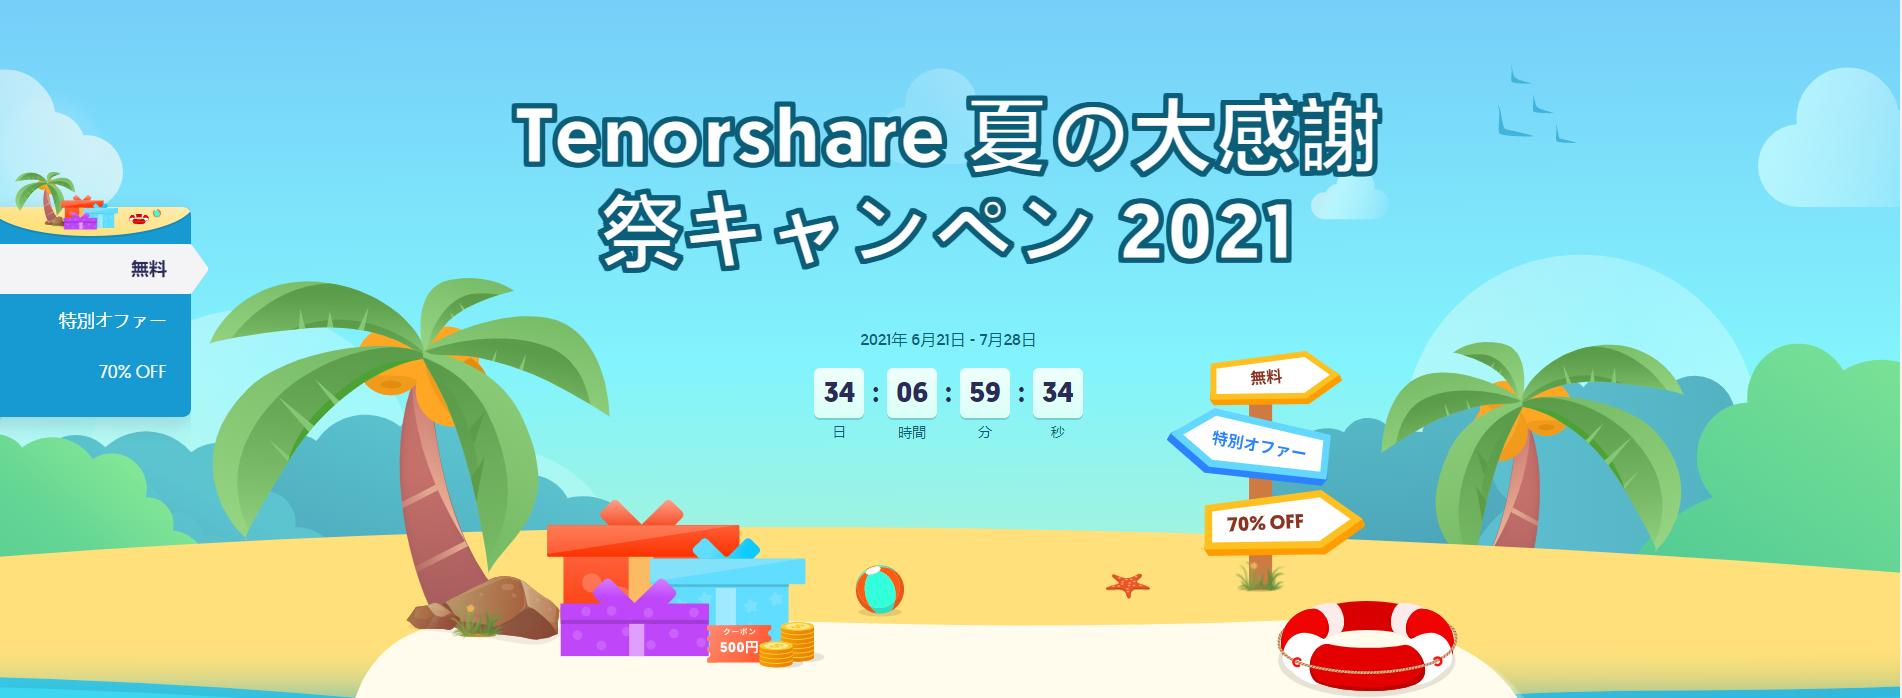 Tenorshare 夏の大感謝祭キャンペンが開催中!史上最も激安! 無料プレゼント|特別オファーと最大割引 70% OFF【2021】